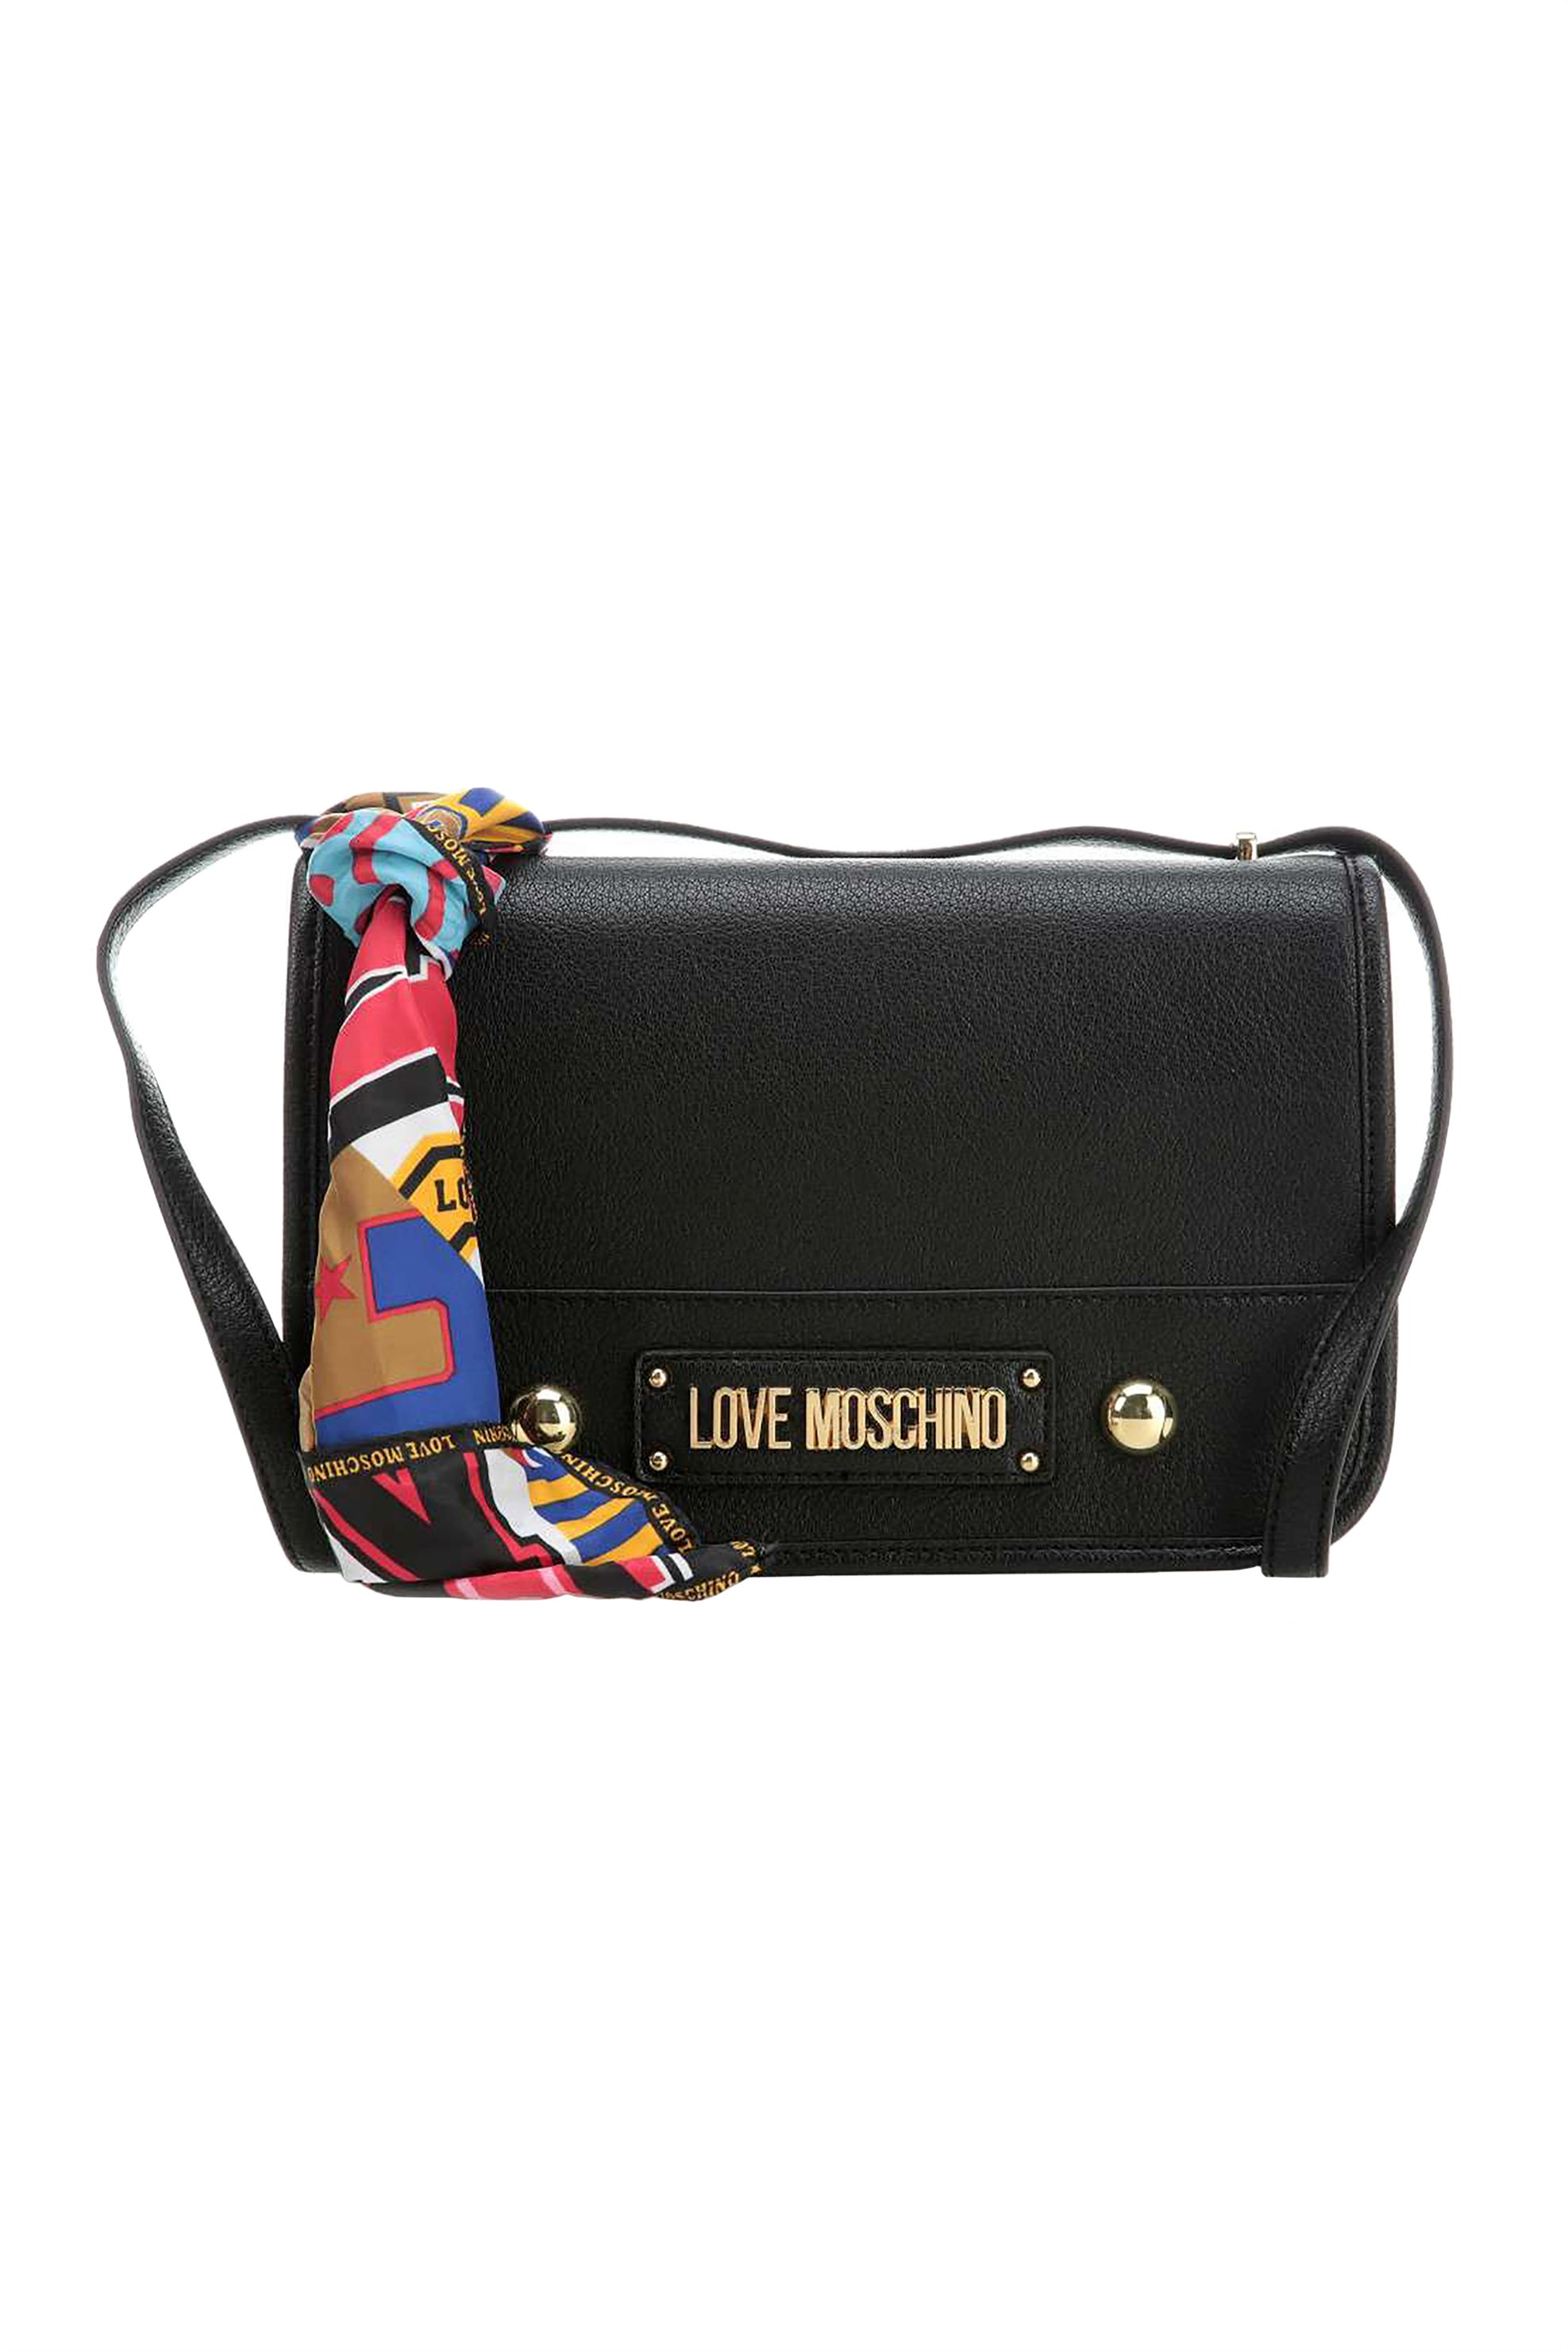 92bf6e30e7 MOSCHINO - Κορυφαία προϊόντα για Γυναικείες Τσάντες